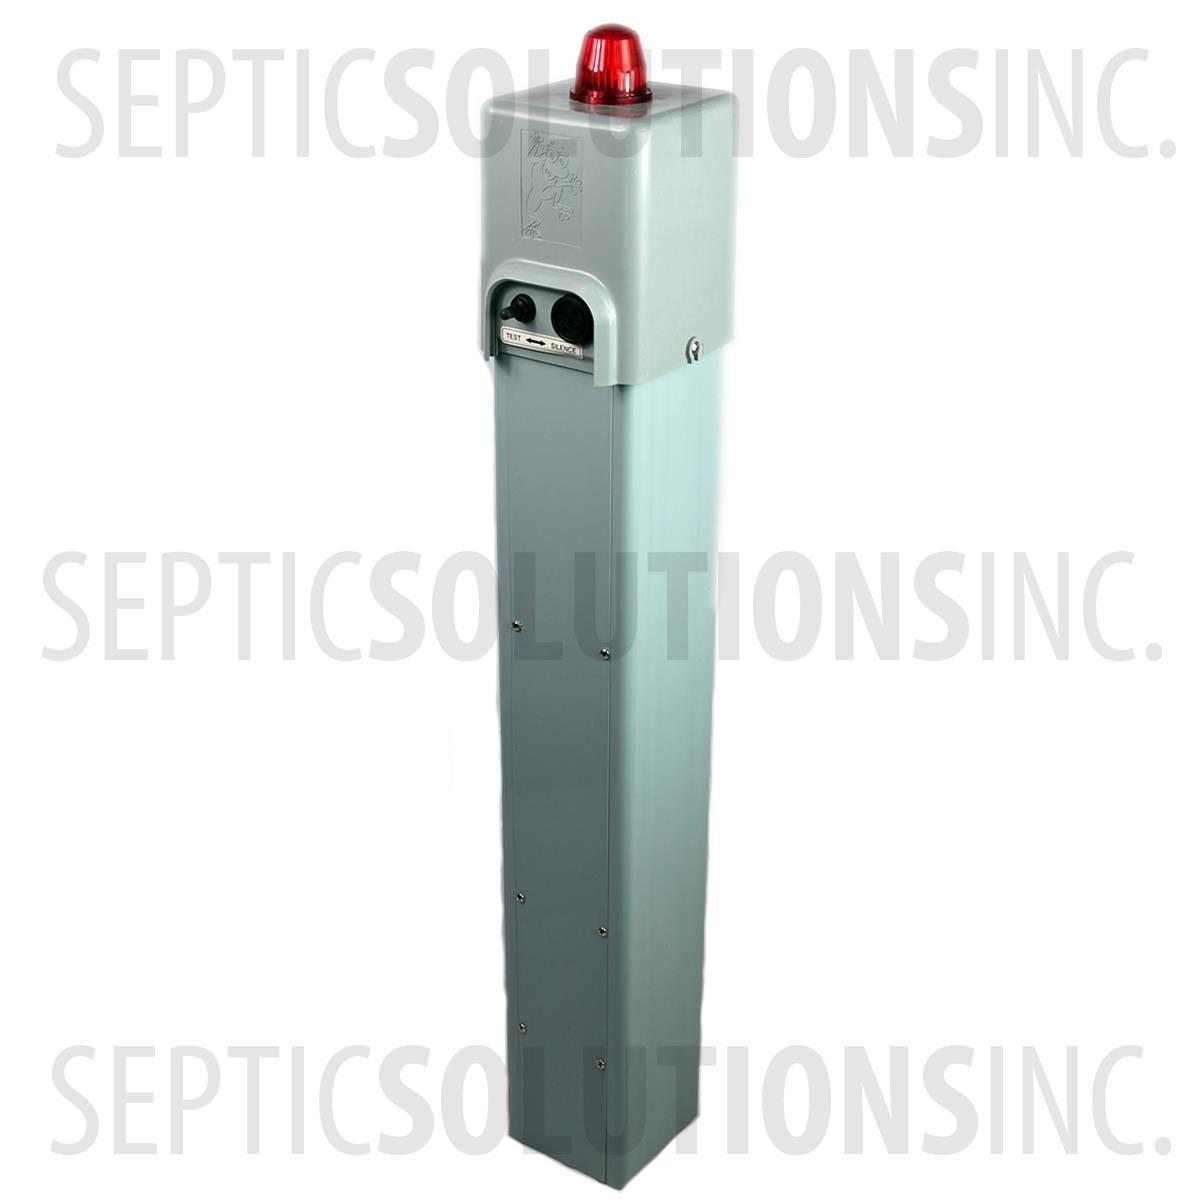 Observer 100 Series Pedestal High Water Alarm 10a100